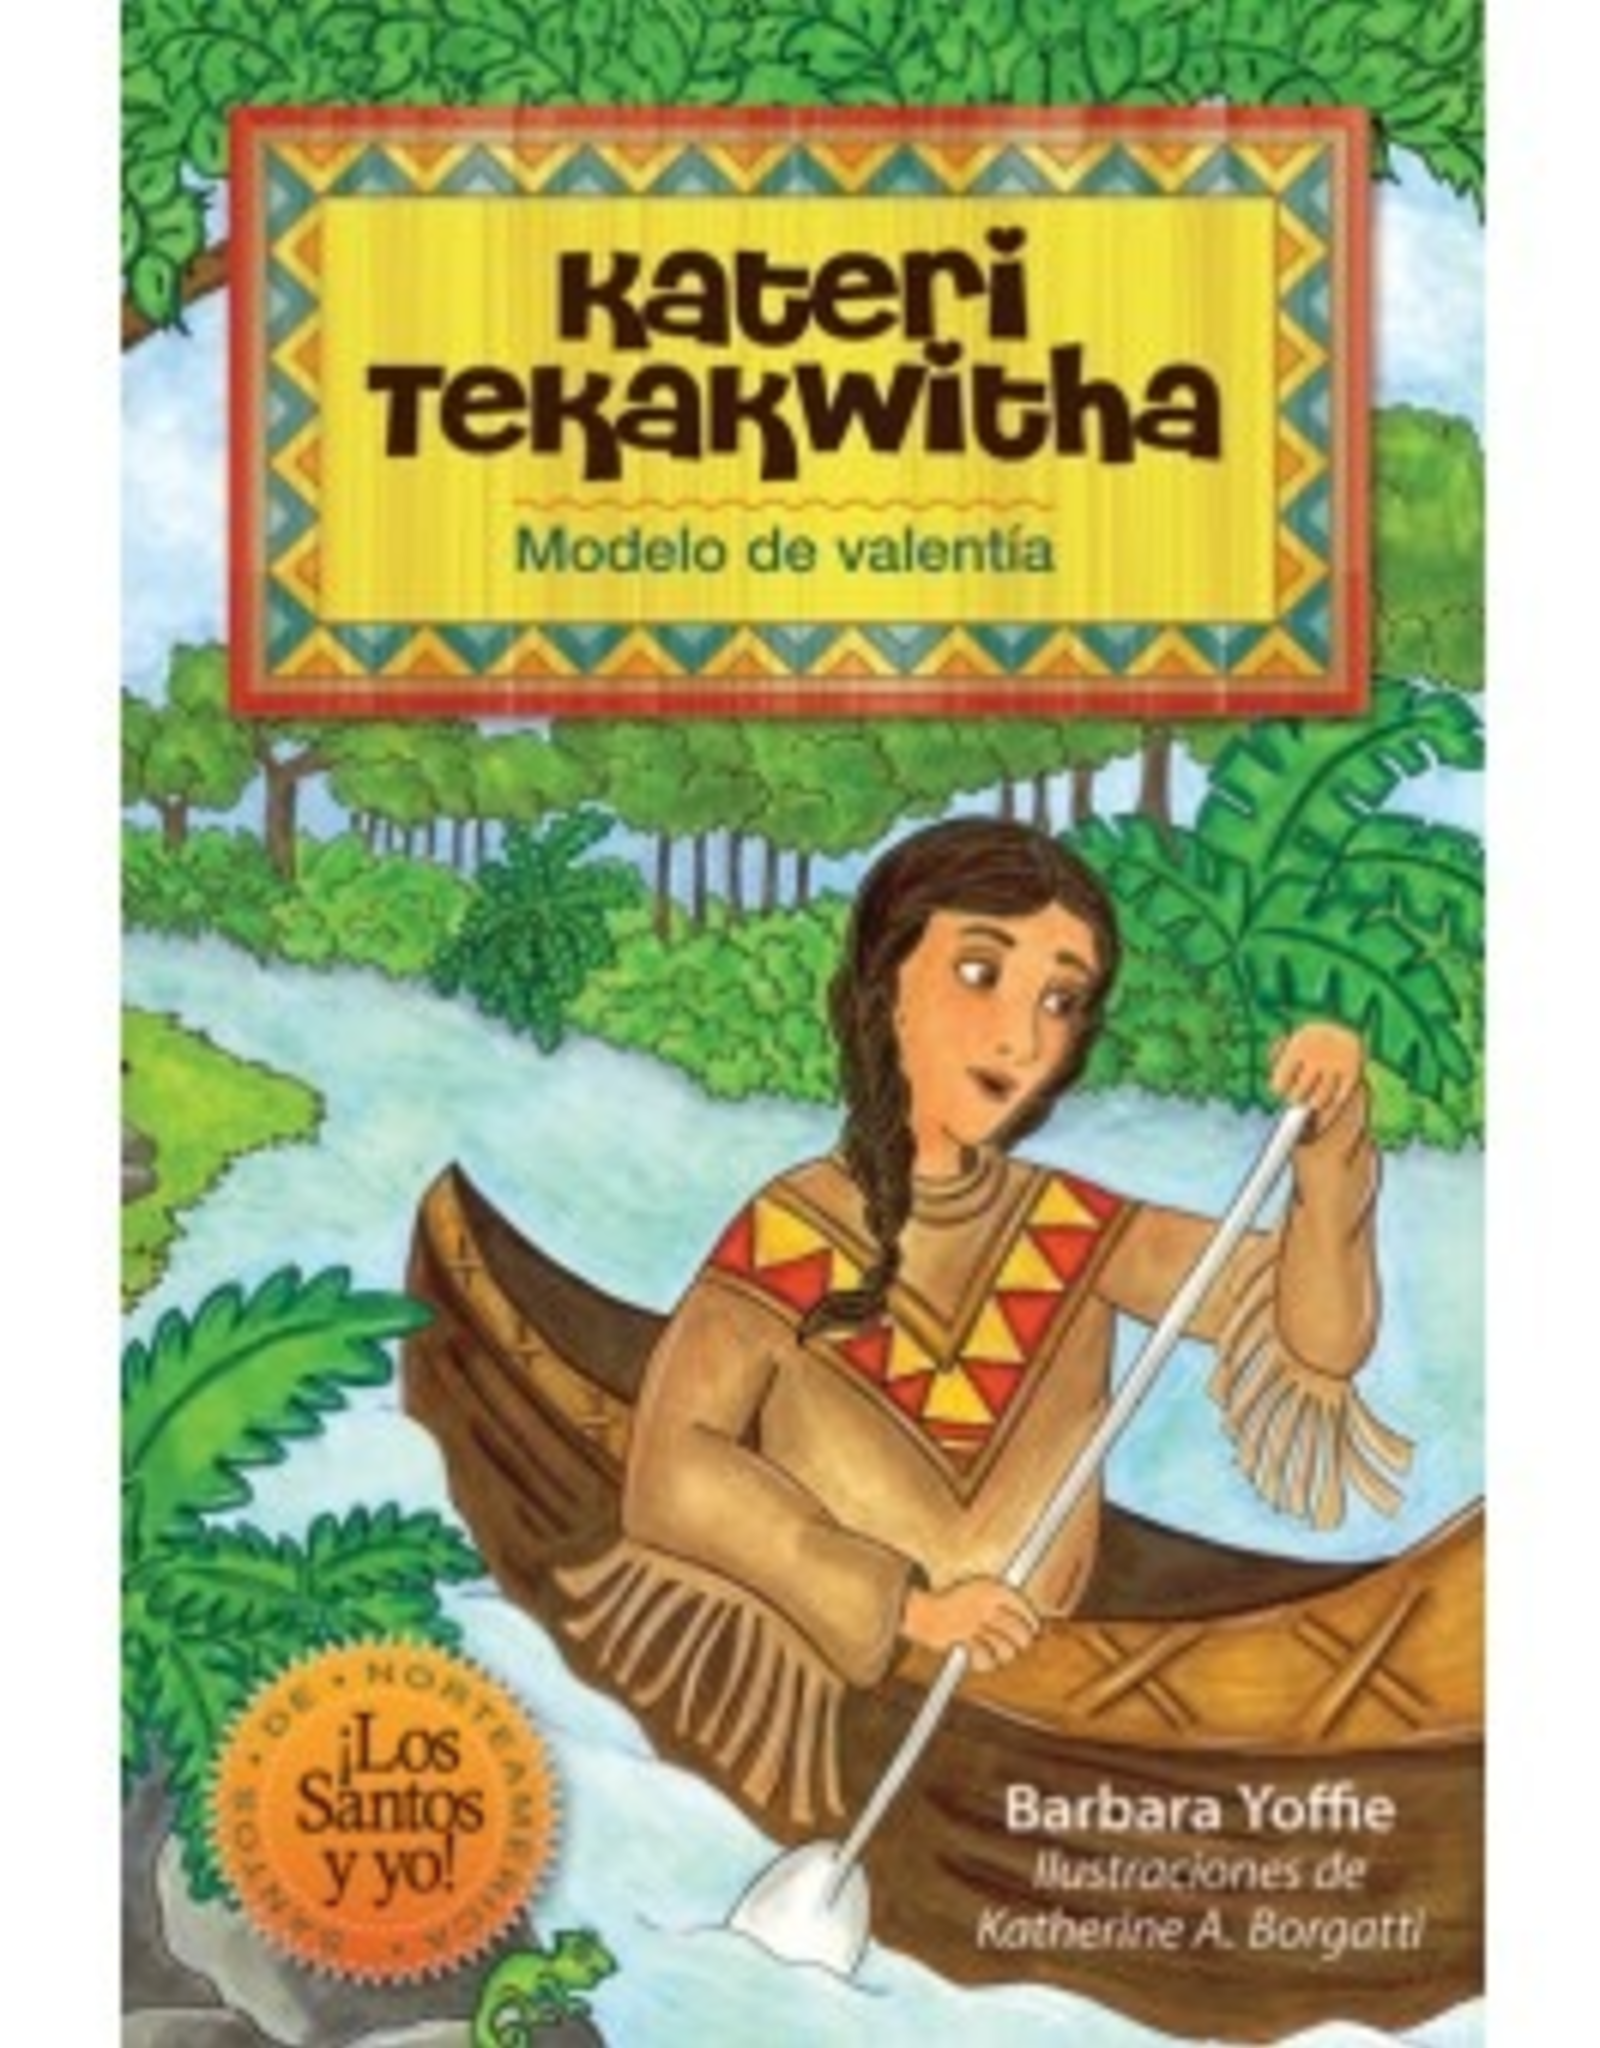 Liguori Kateri Tekakwitha: Modelo de valentÌ_a,  Barbara Yoffie-- Ilustraciones de Katherine A. Borgatti